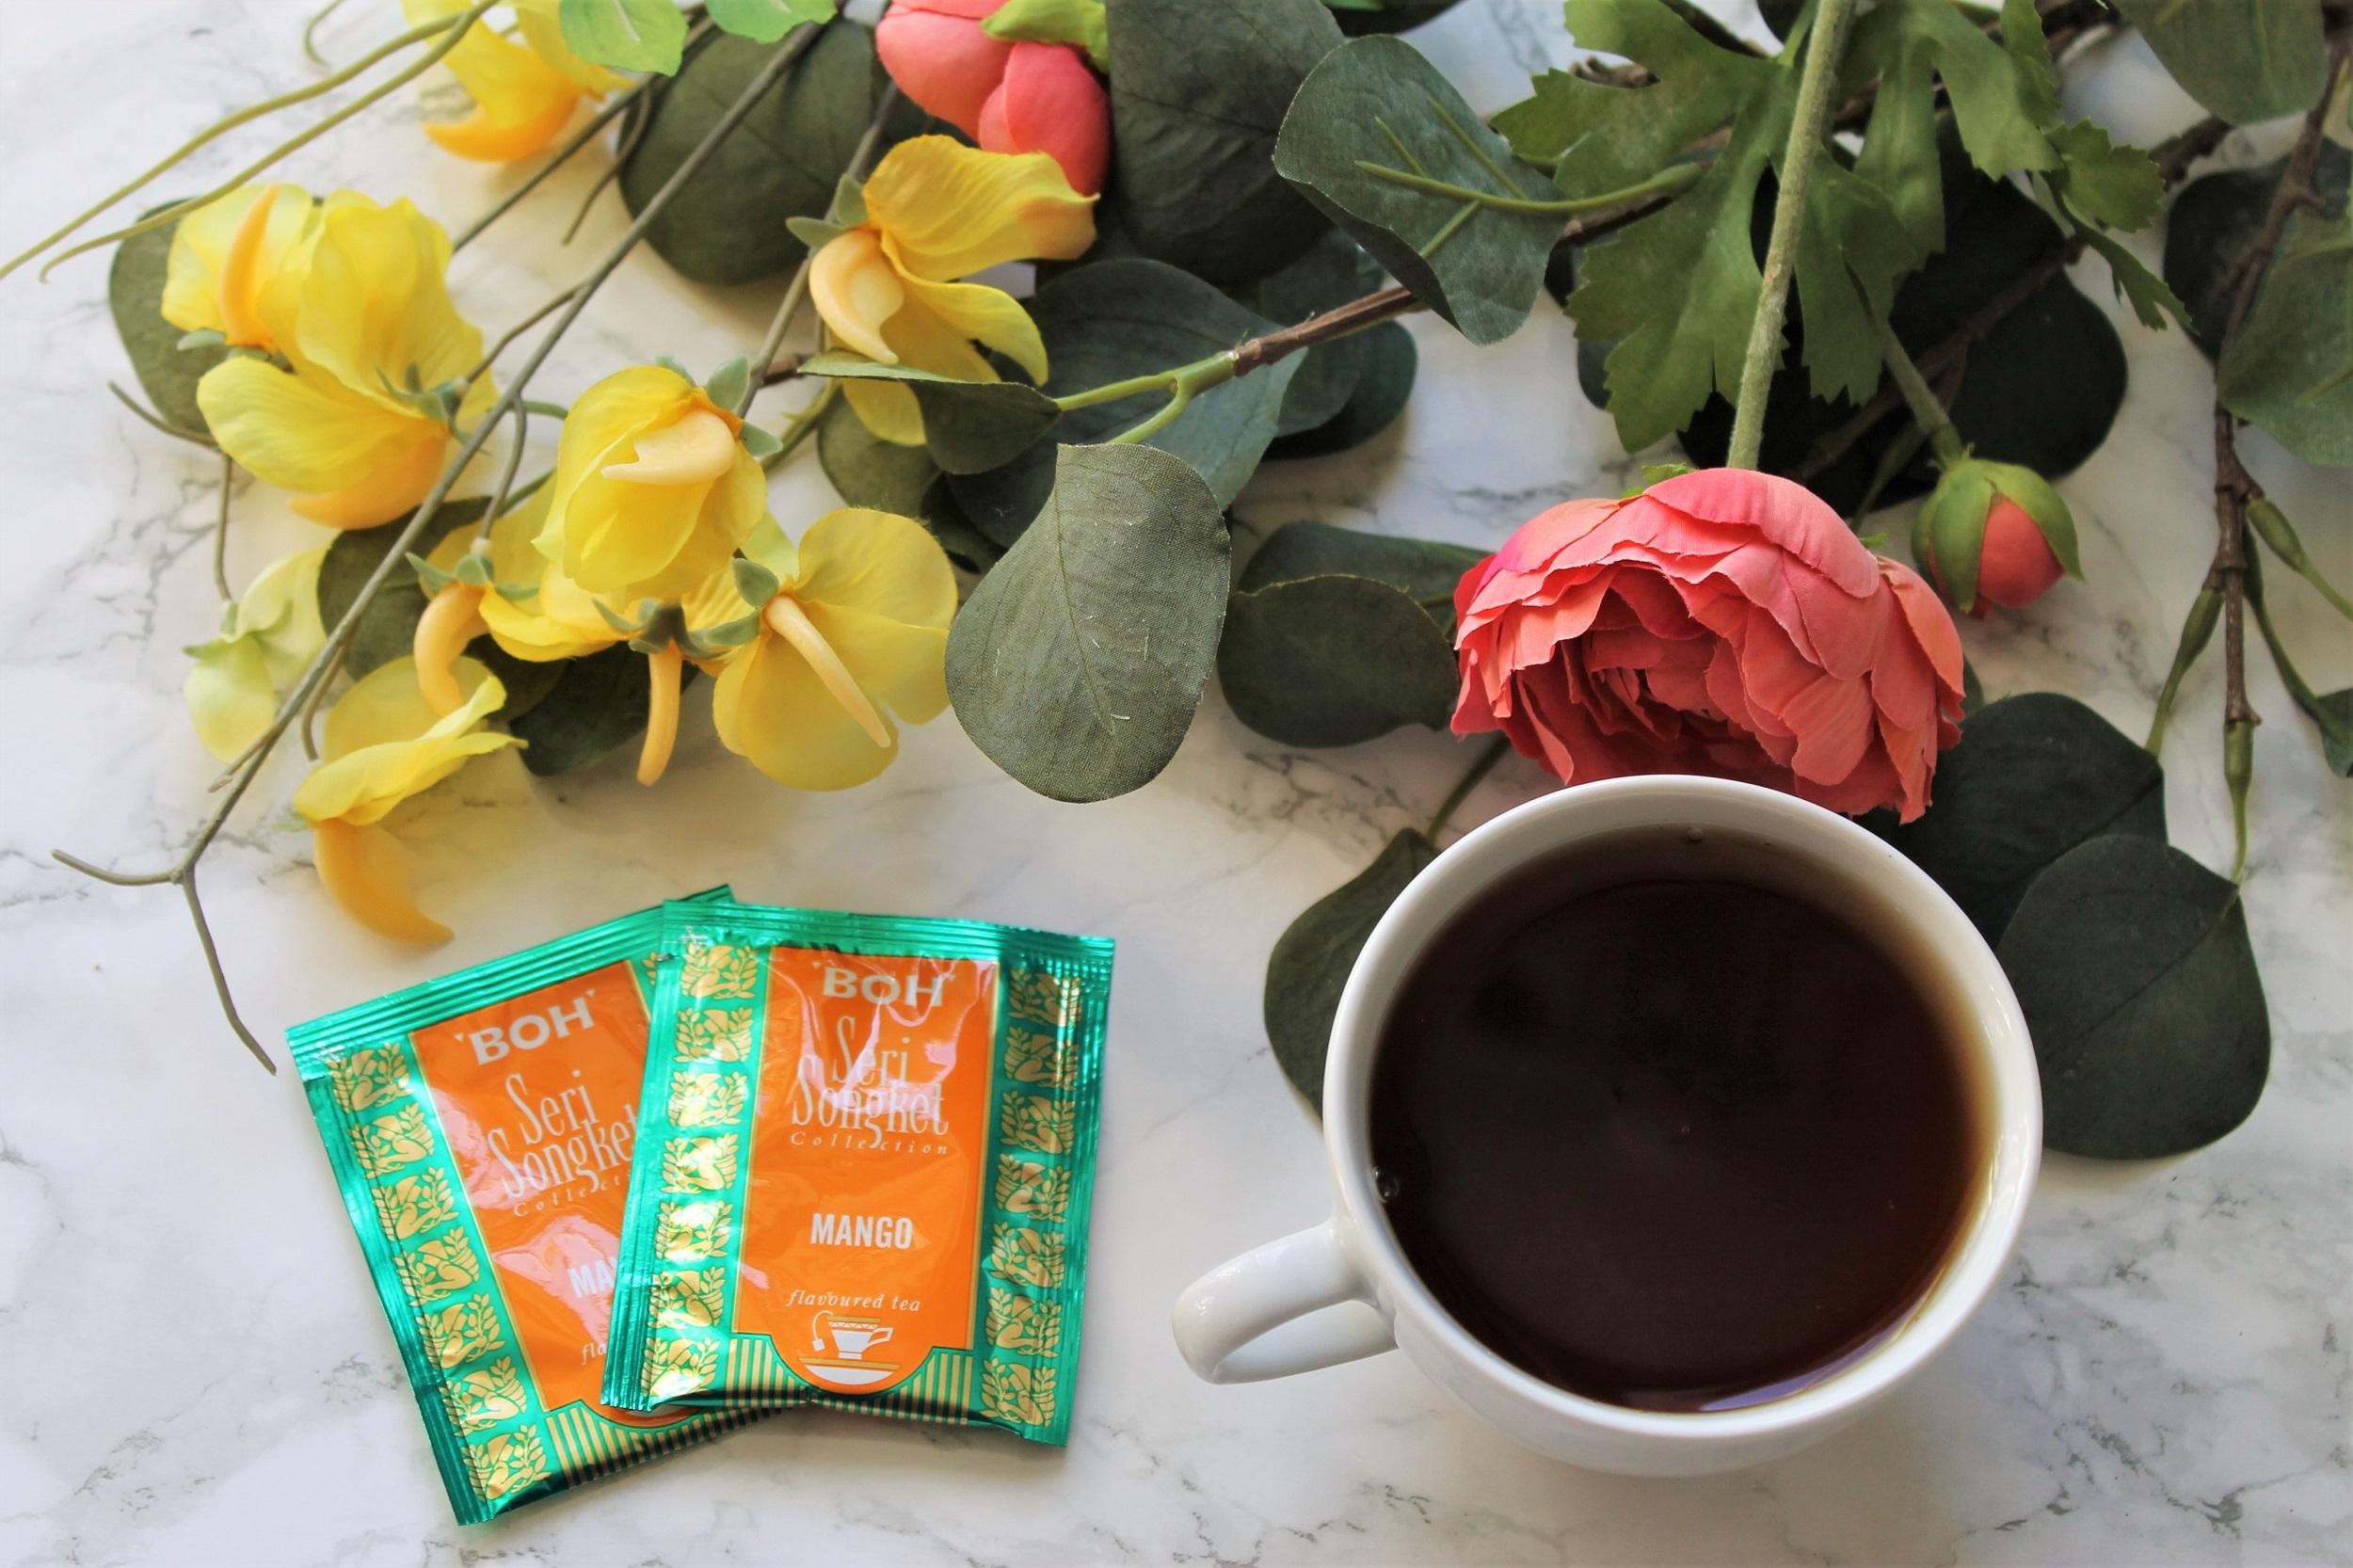 BOH Mango Tea Review